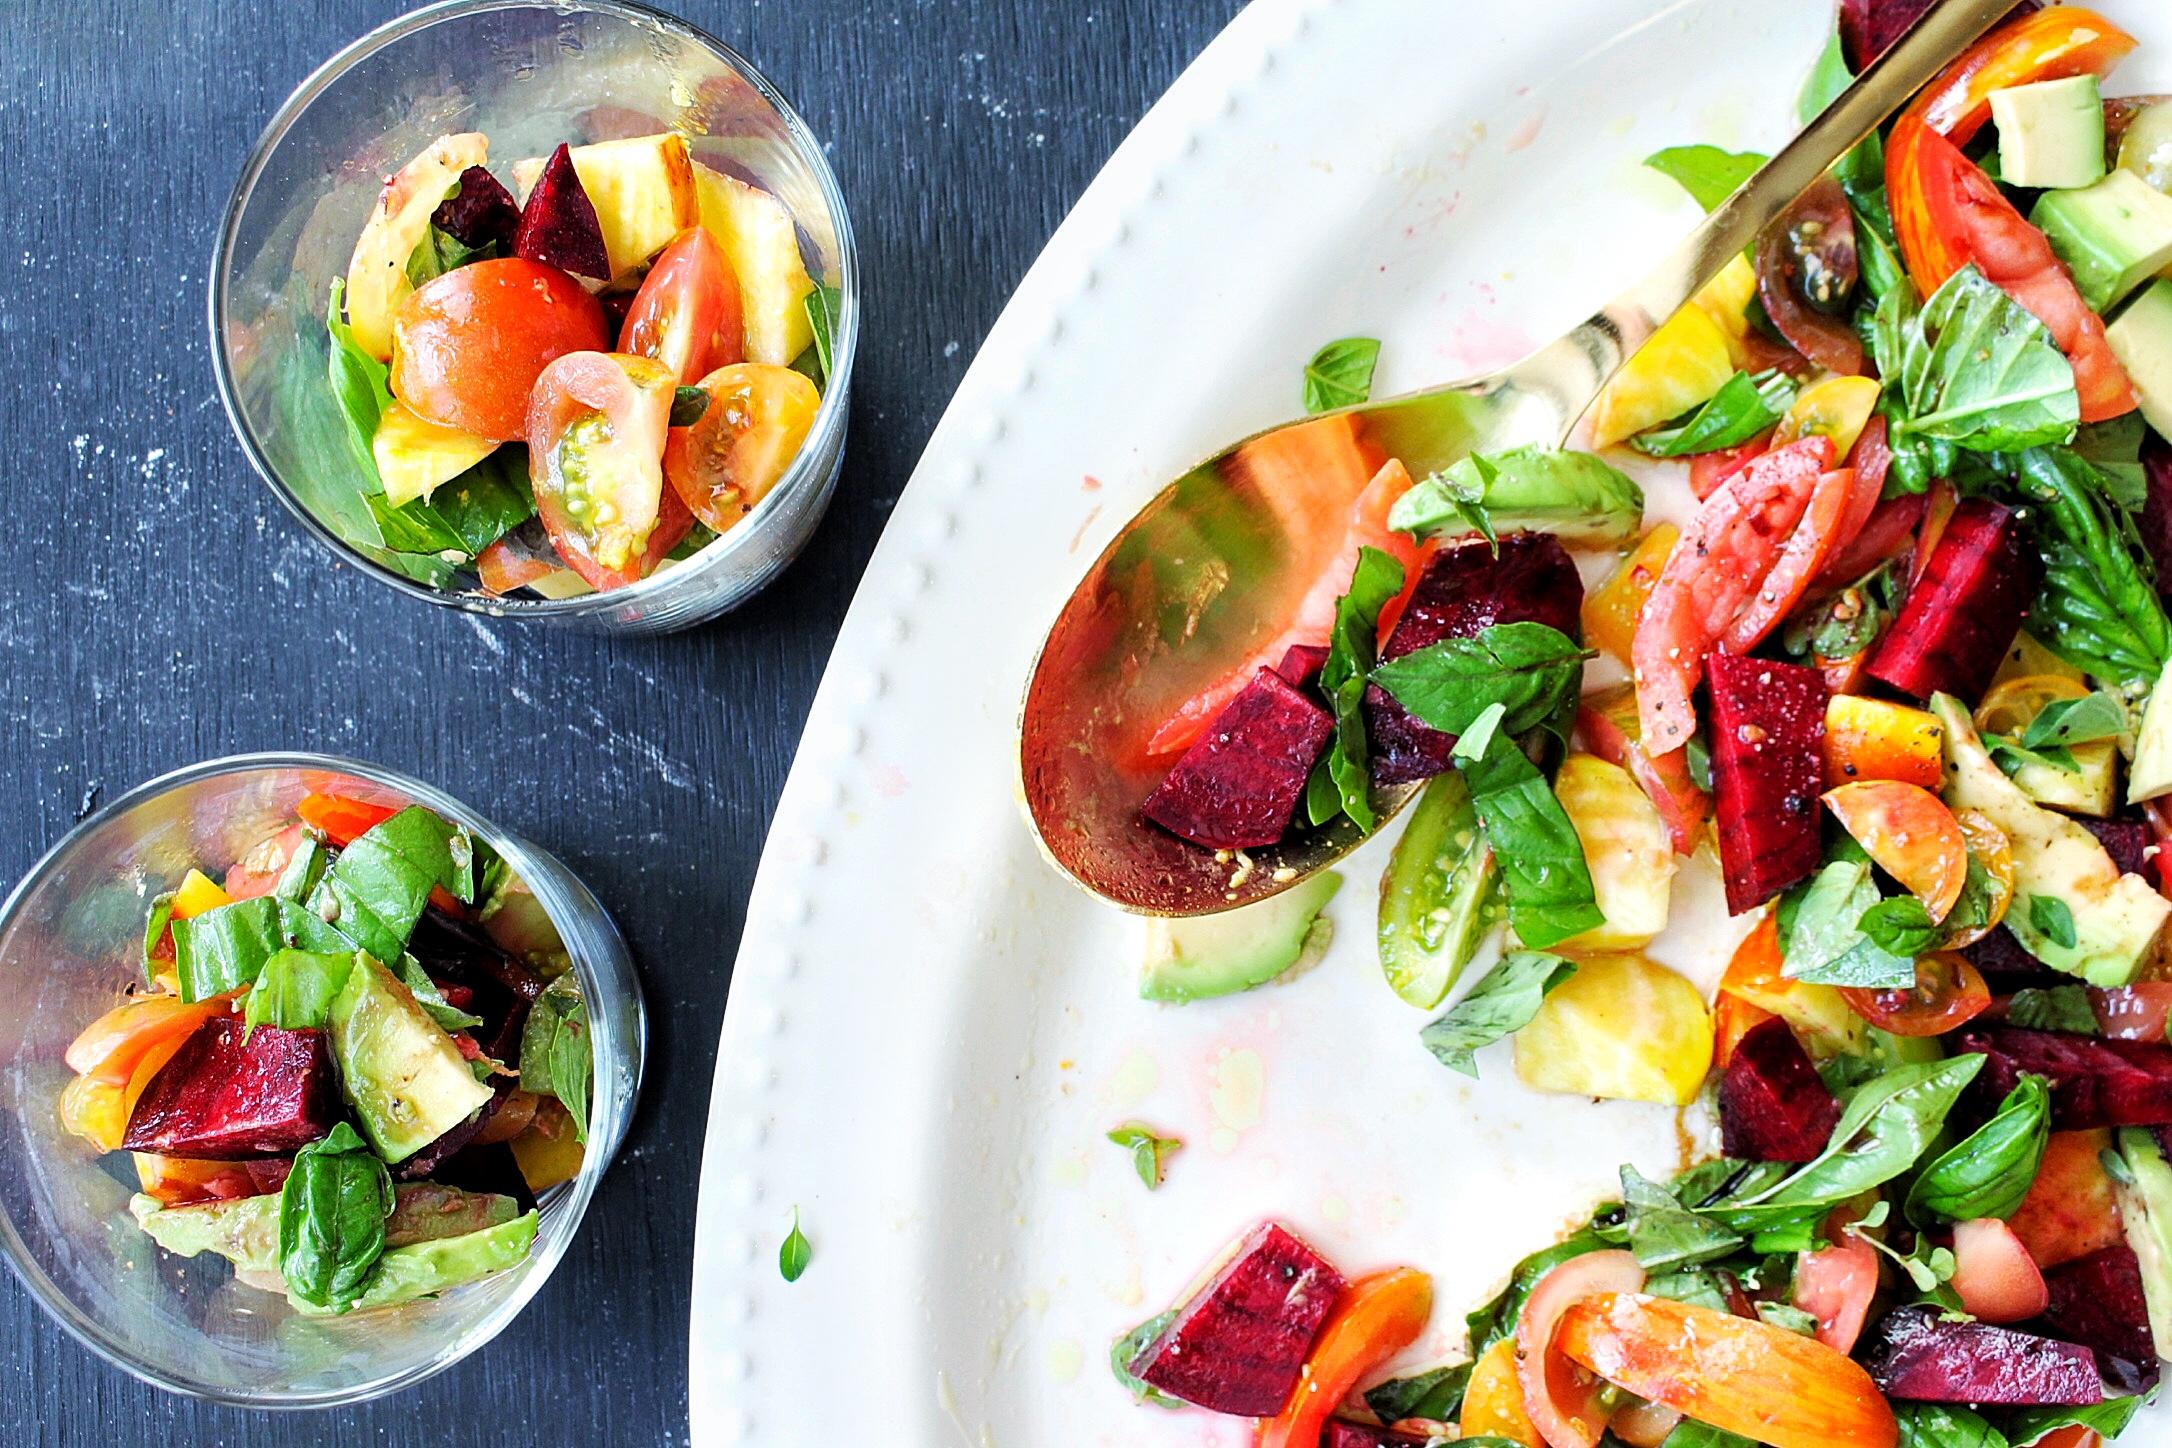 All of It - Heirloom Tomato/Beet/Avocado/Herb Summer Salad